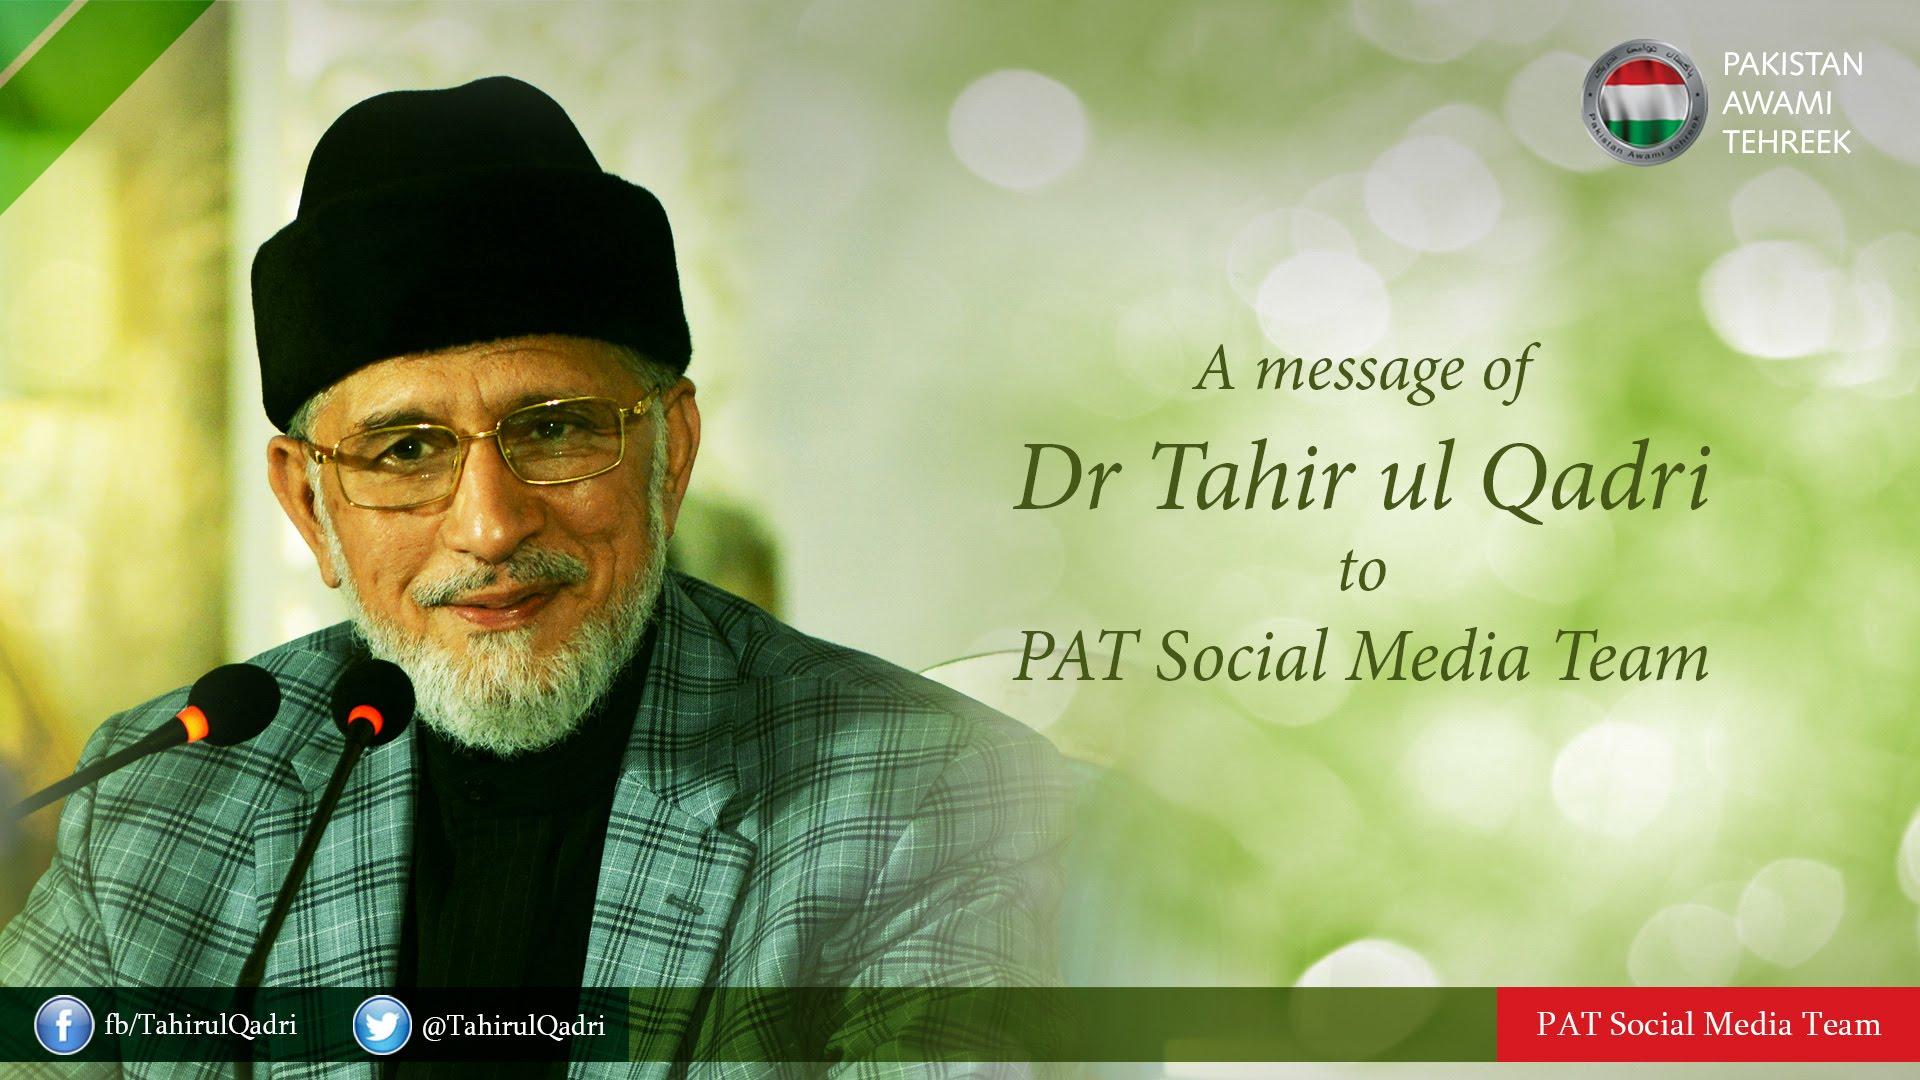 A message of Dr Tahir-ul-Qadri to PAT Social Media Team